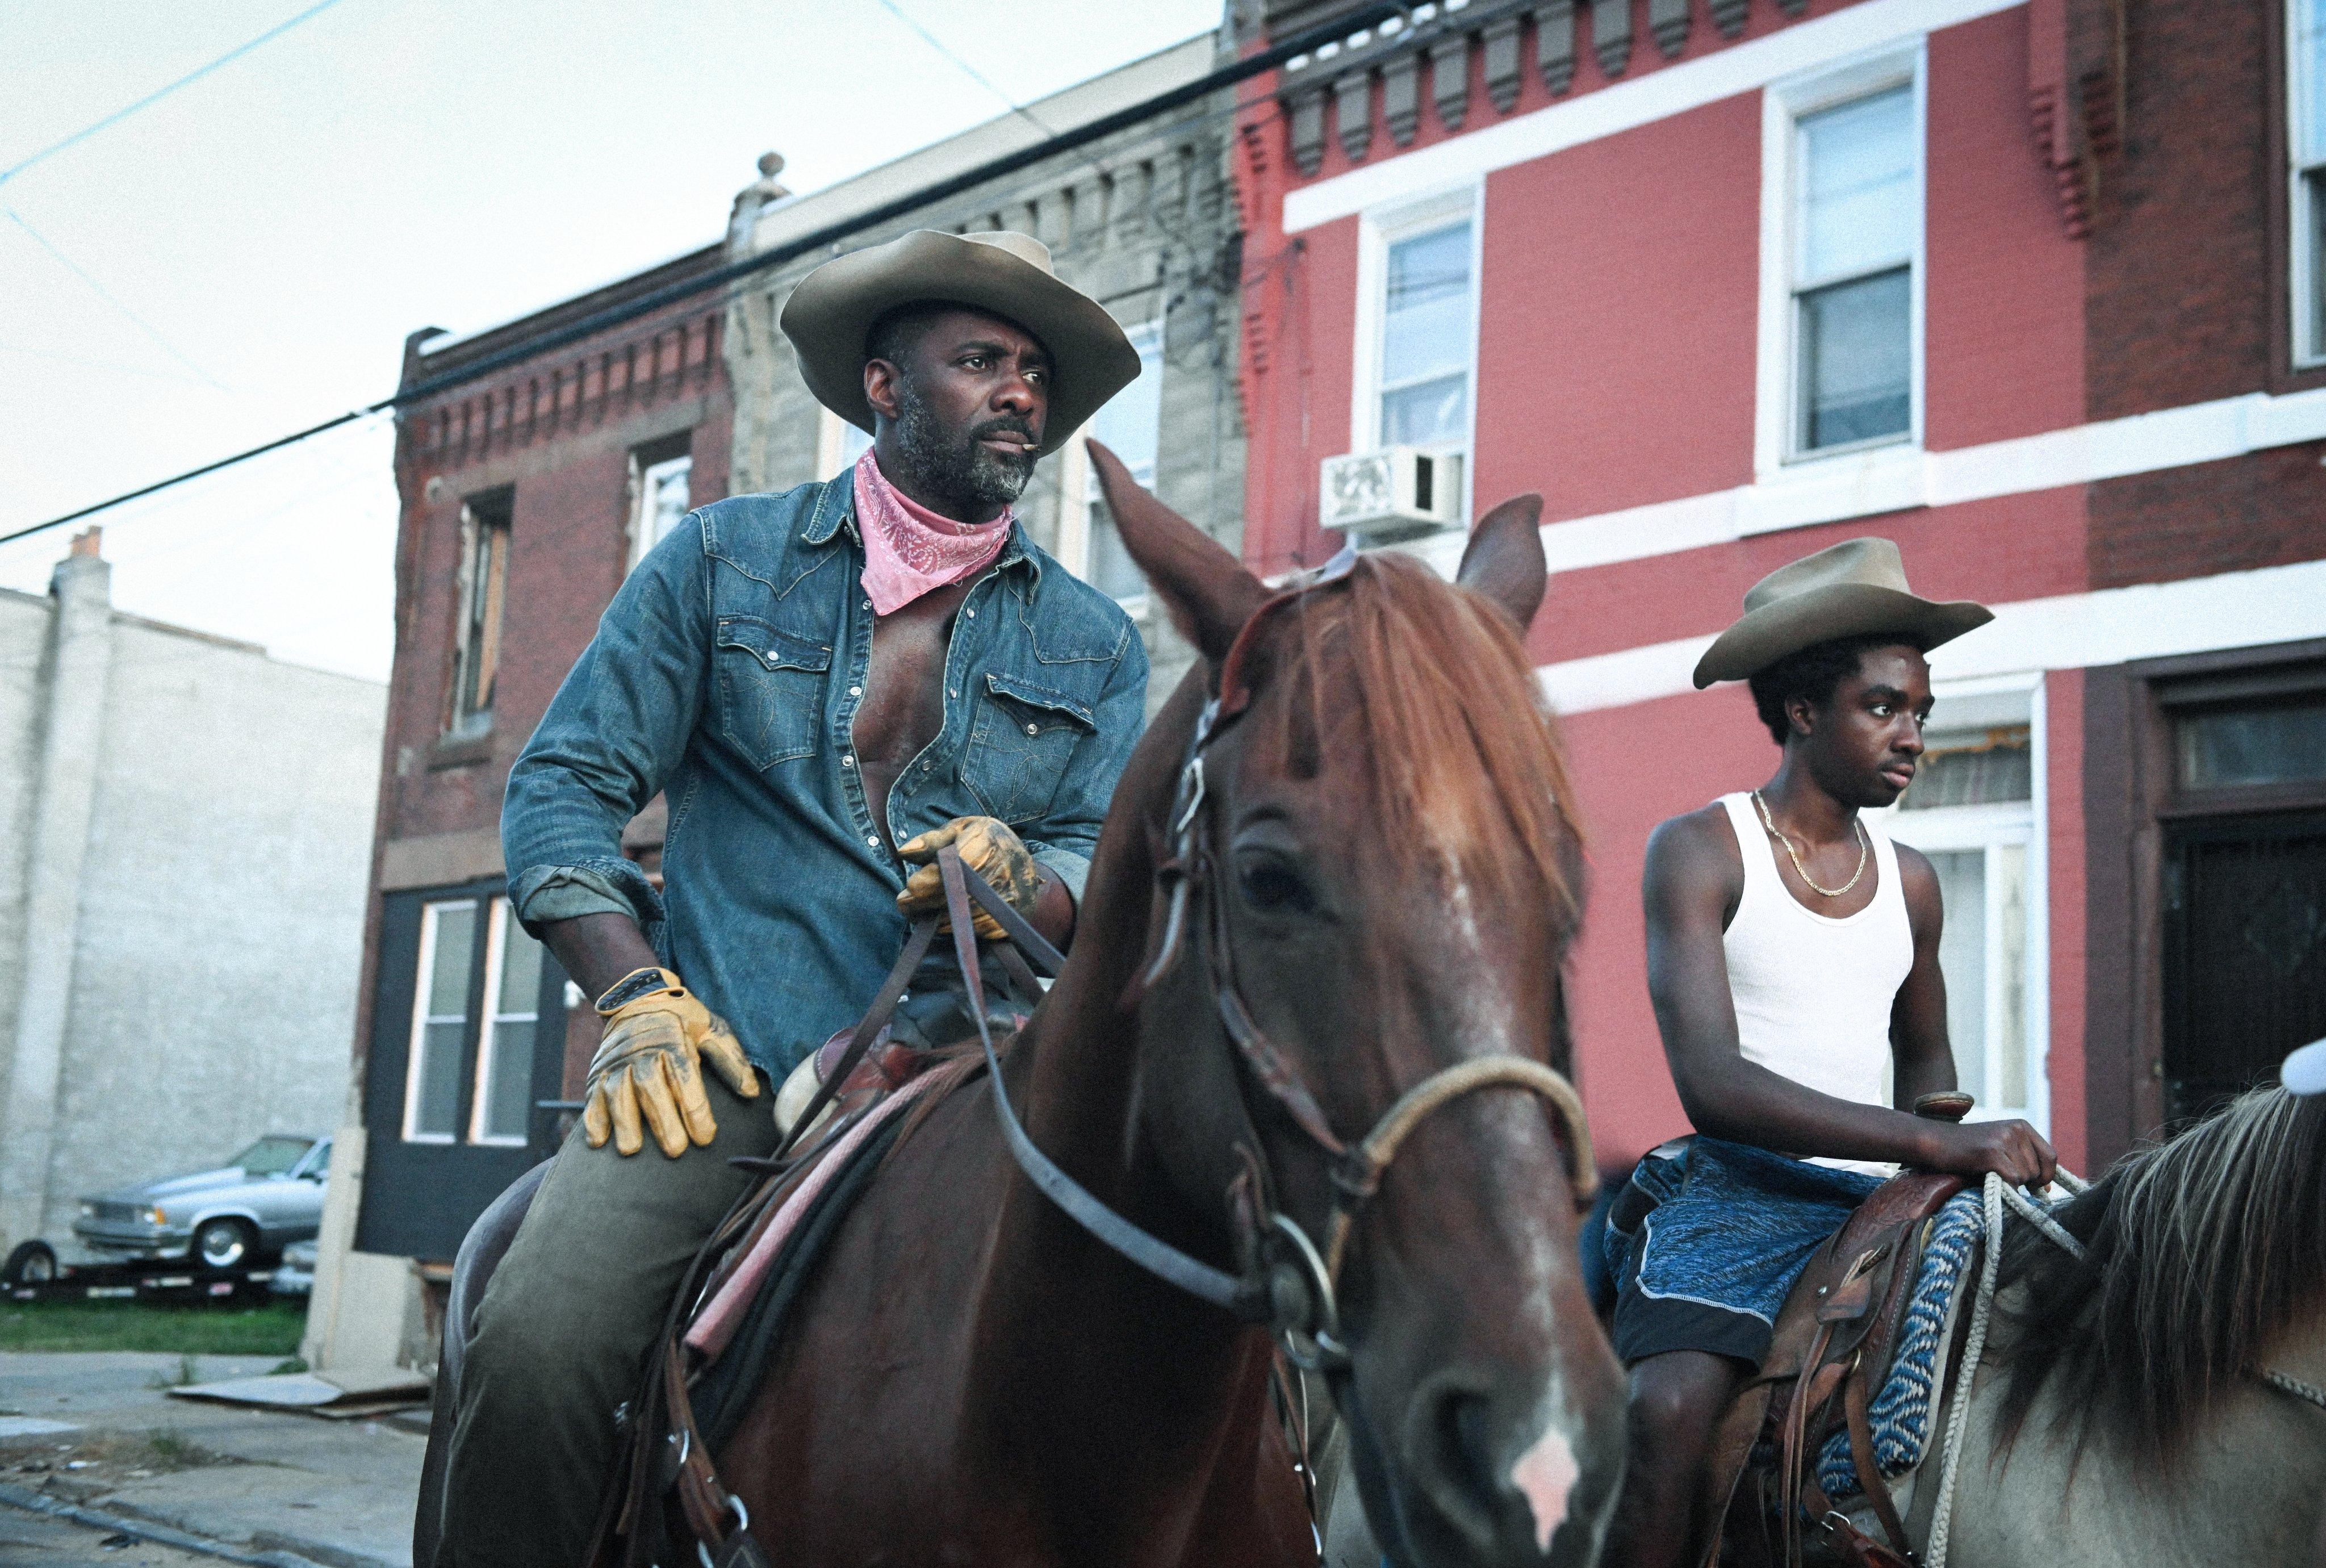 Netflix divulga trailer de Alma de Cowboy, filme estrelado por Idris Elba e Caleb McLaughlin